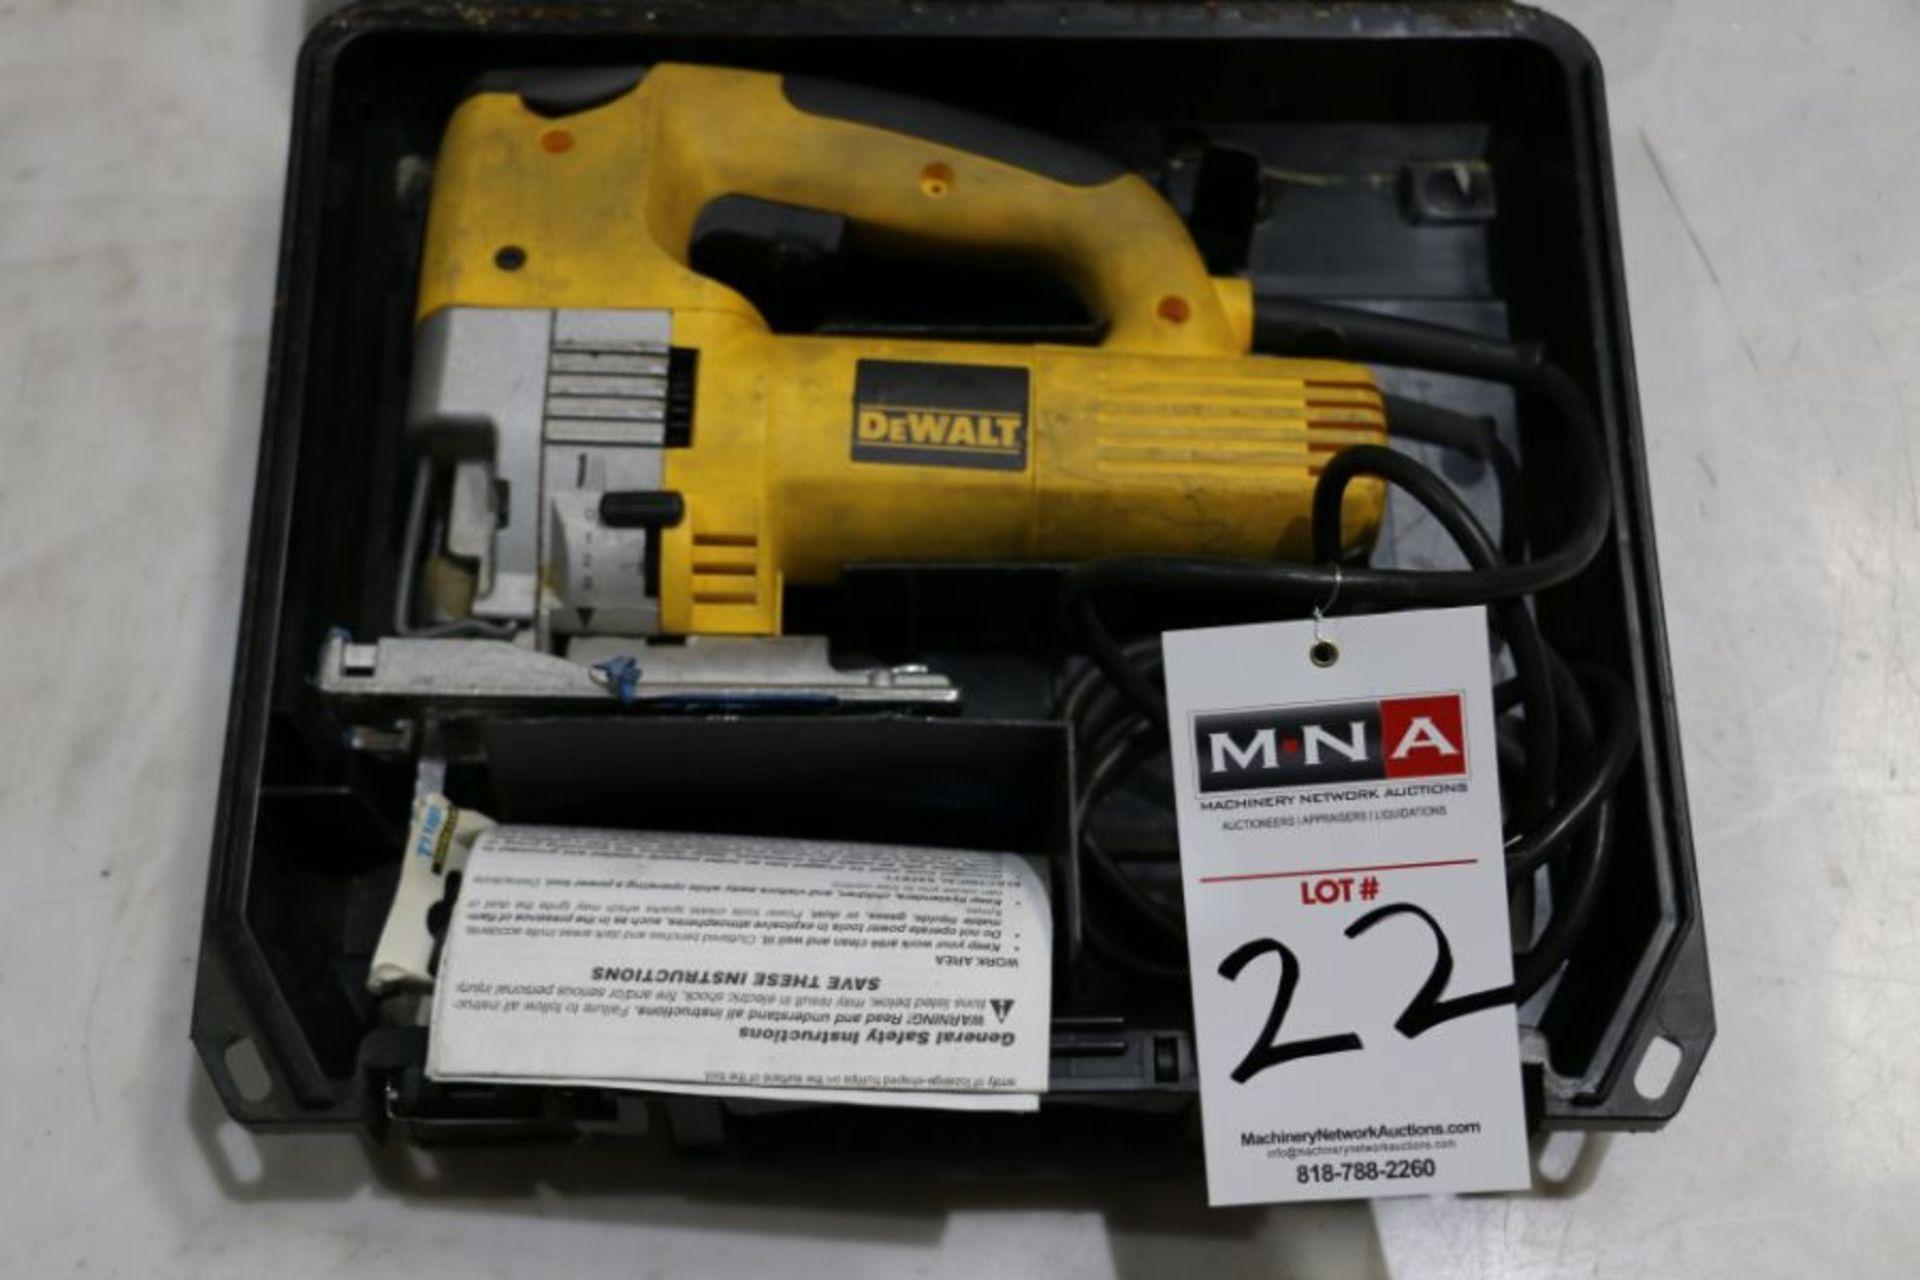 Dewalt DW321 Variable Speed 60mm Jig Saw